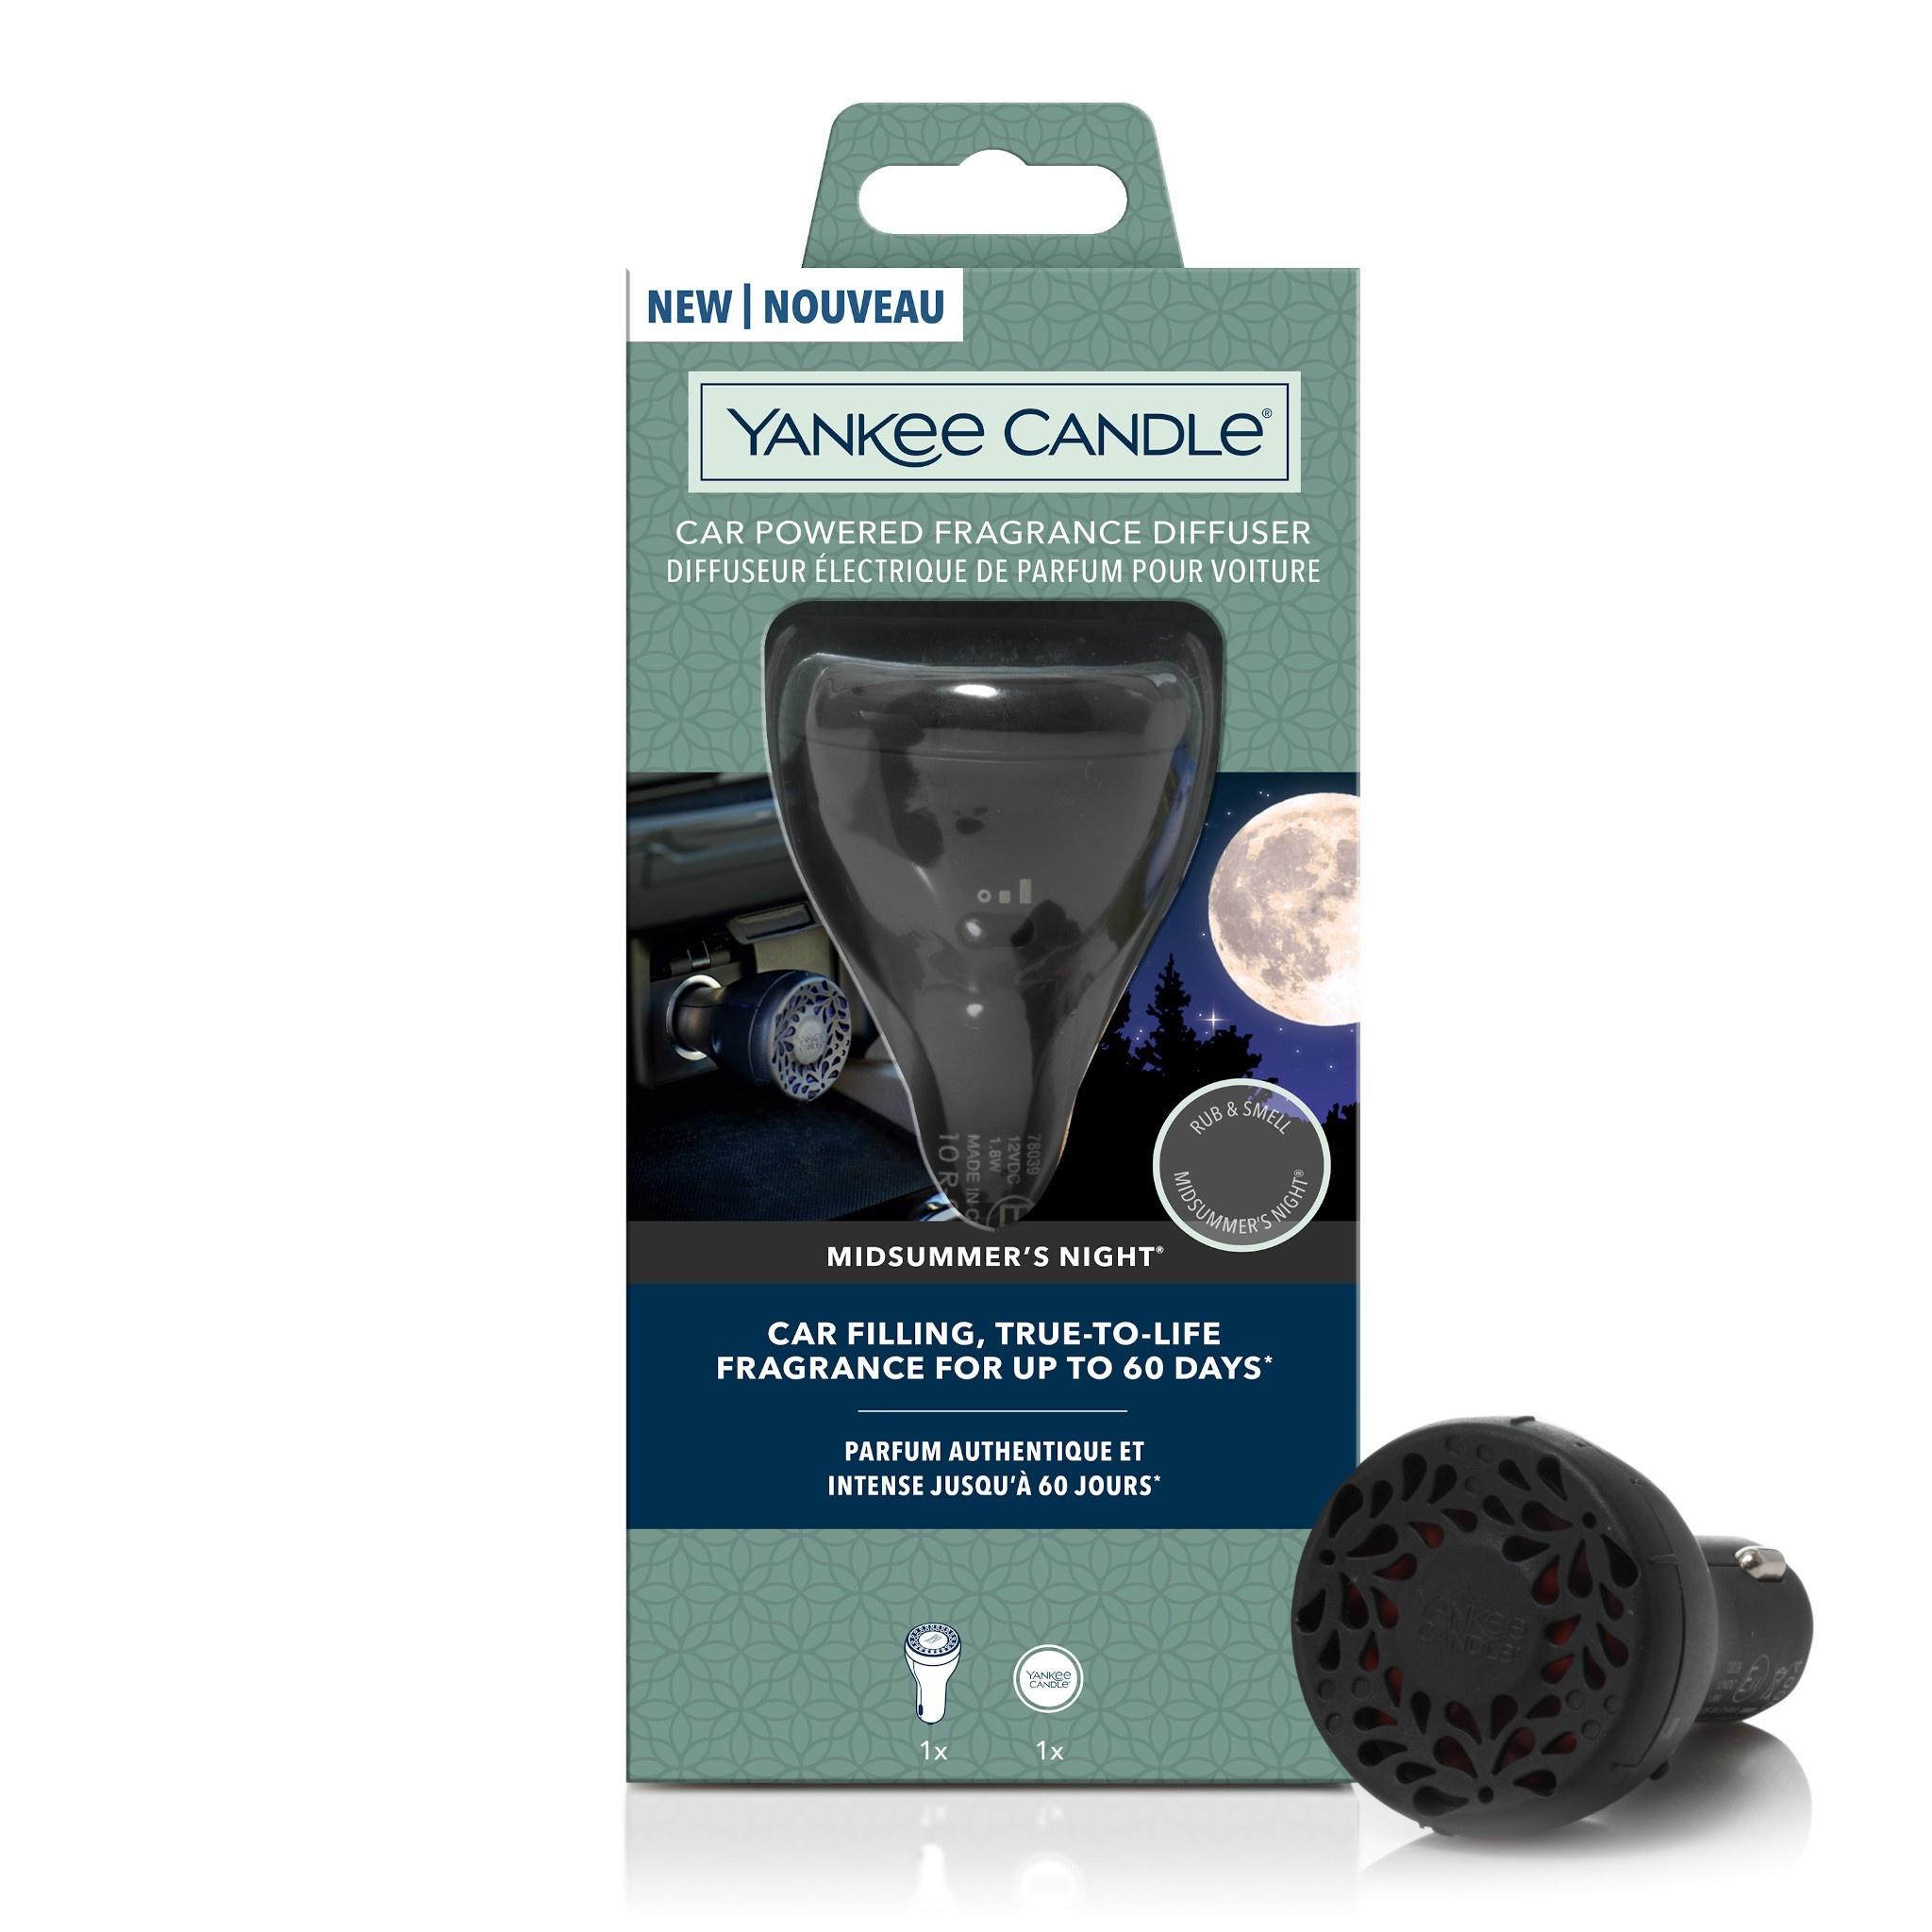 Yankee Candle - Midsummer's Night Starter Kit Car Powered Fragrance